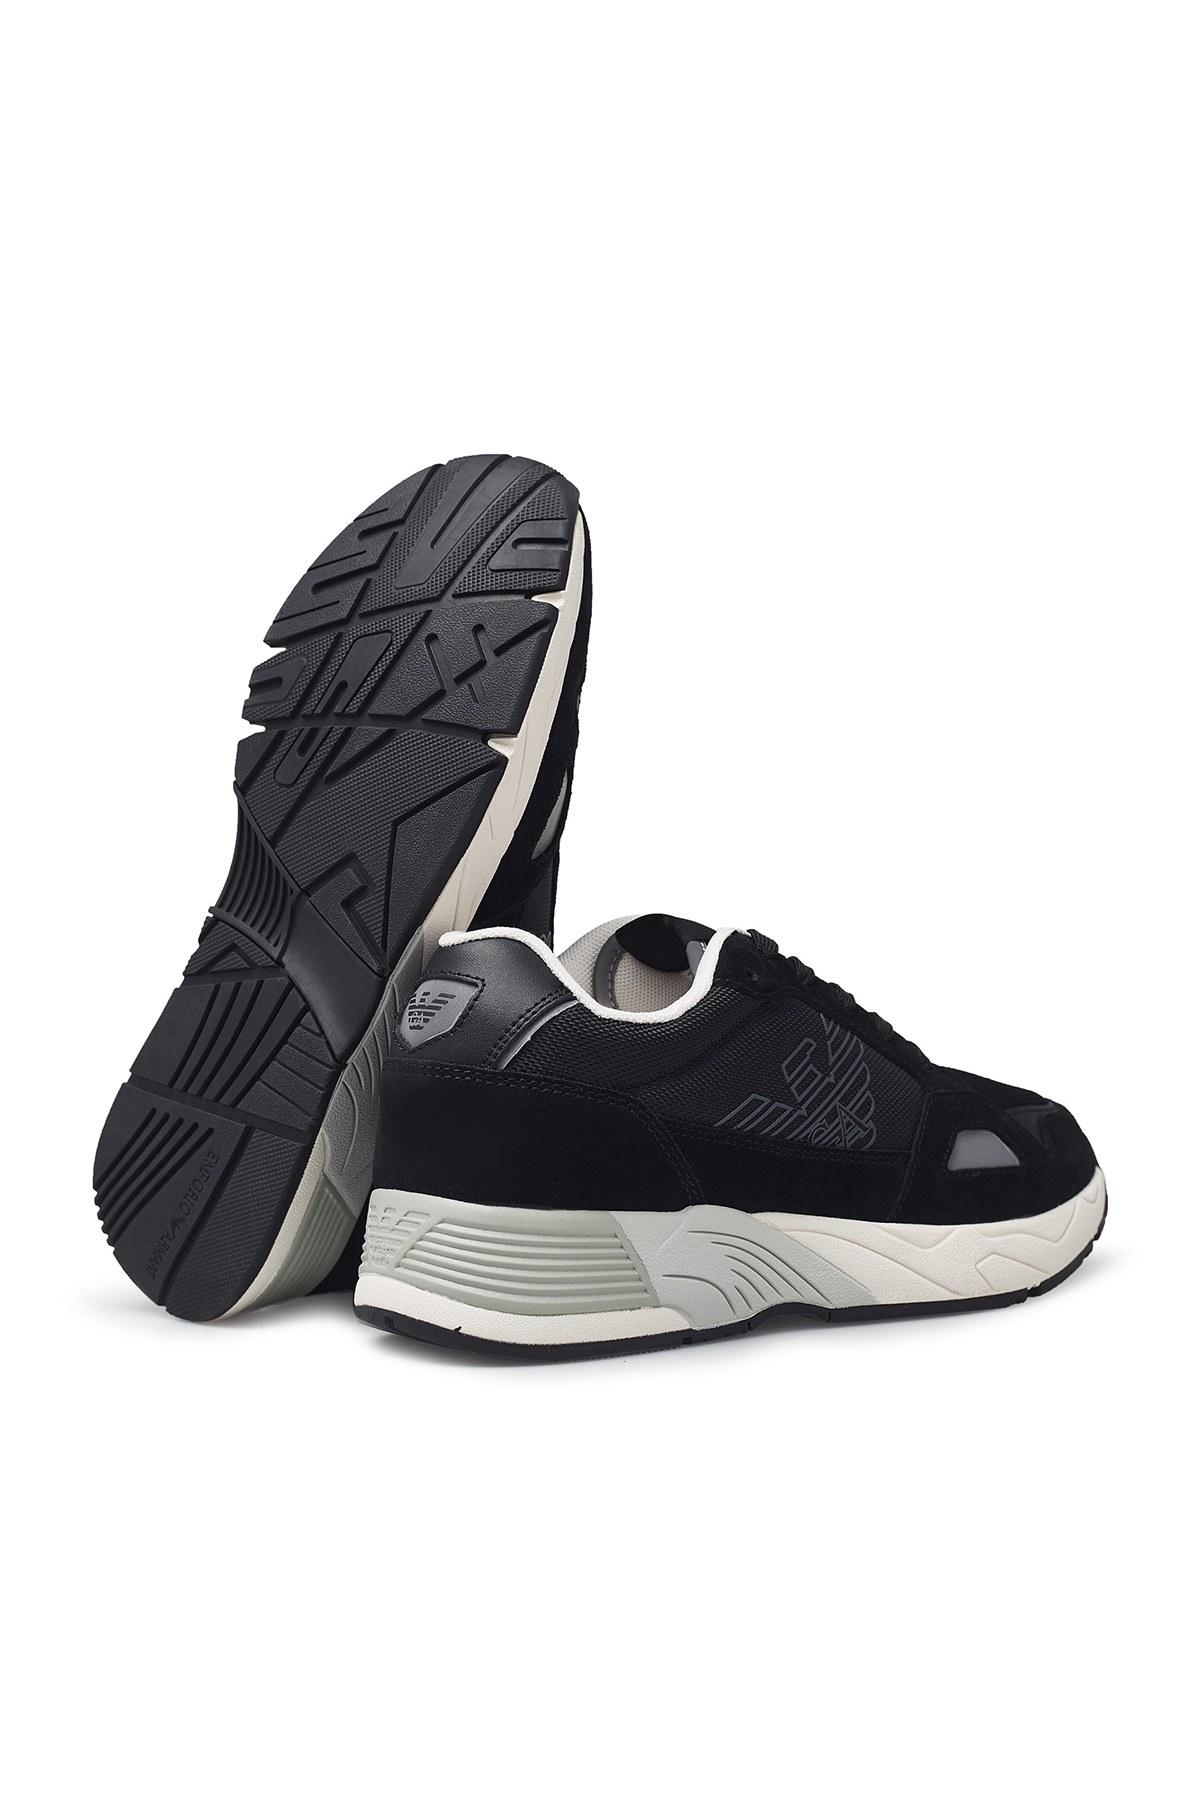 Emporio Armani Erkek Ayakkabı X4X245 XL697 B461 SİYAH